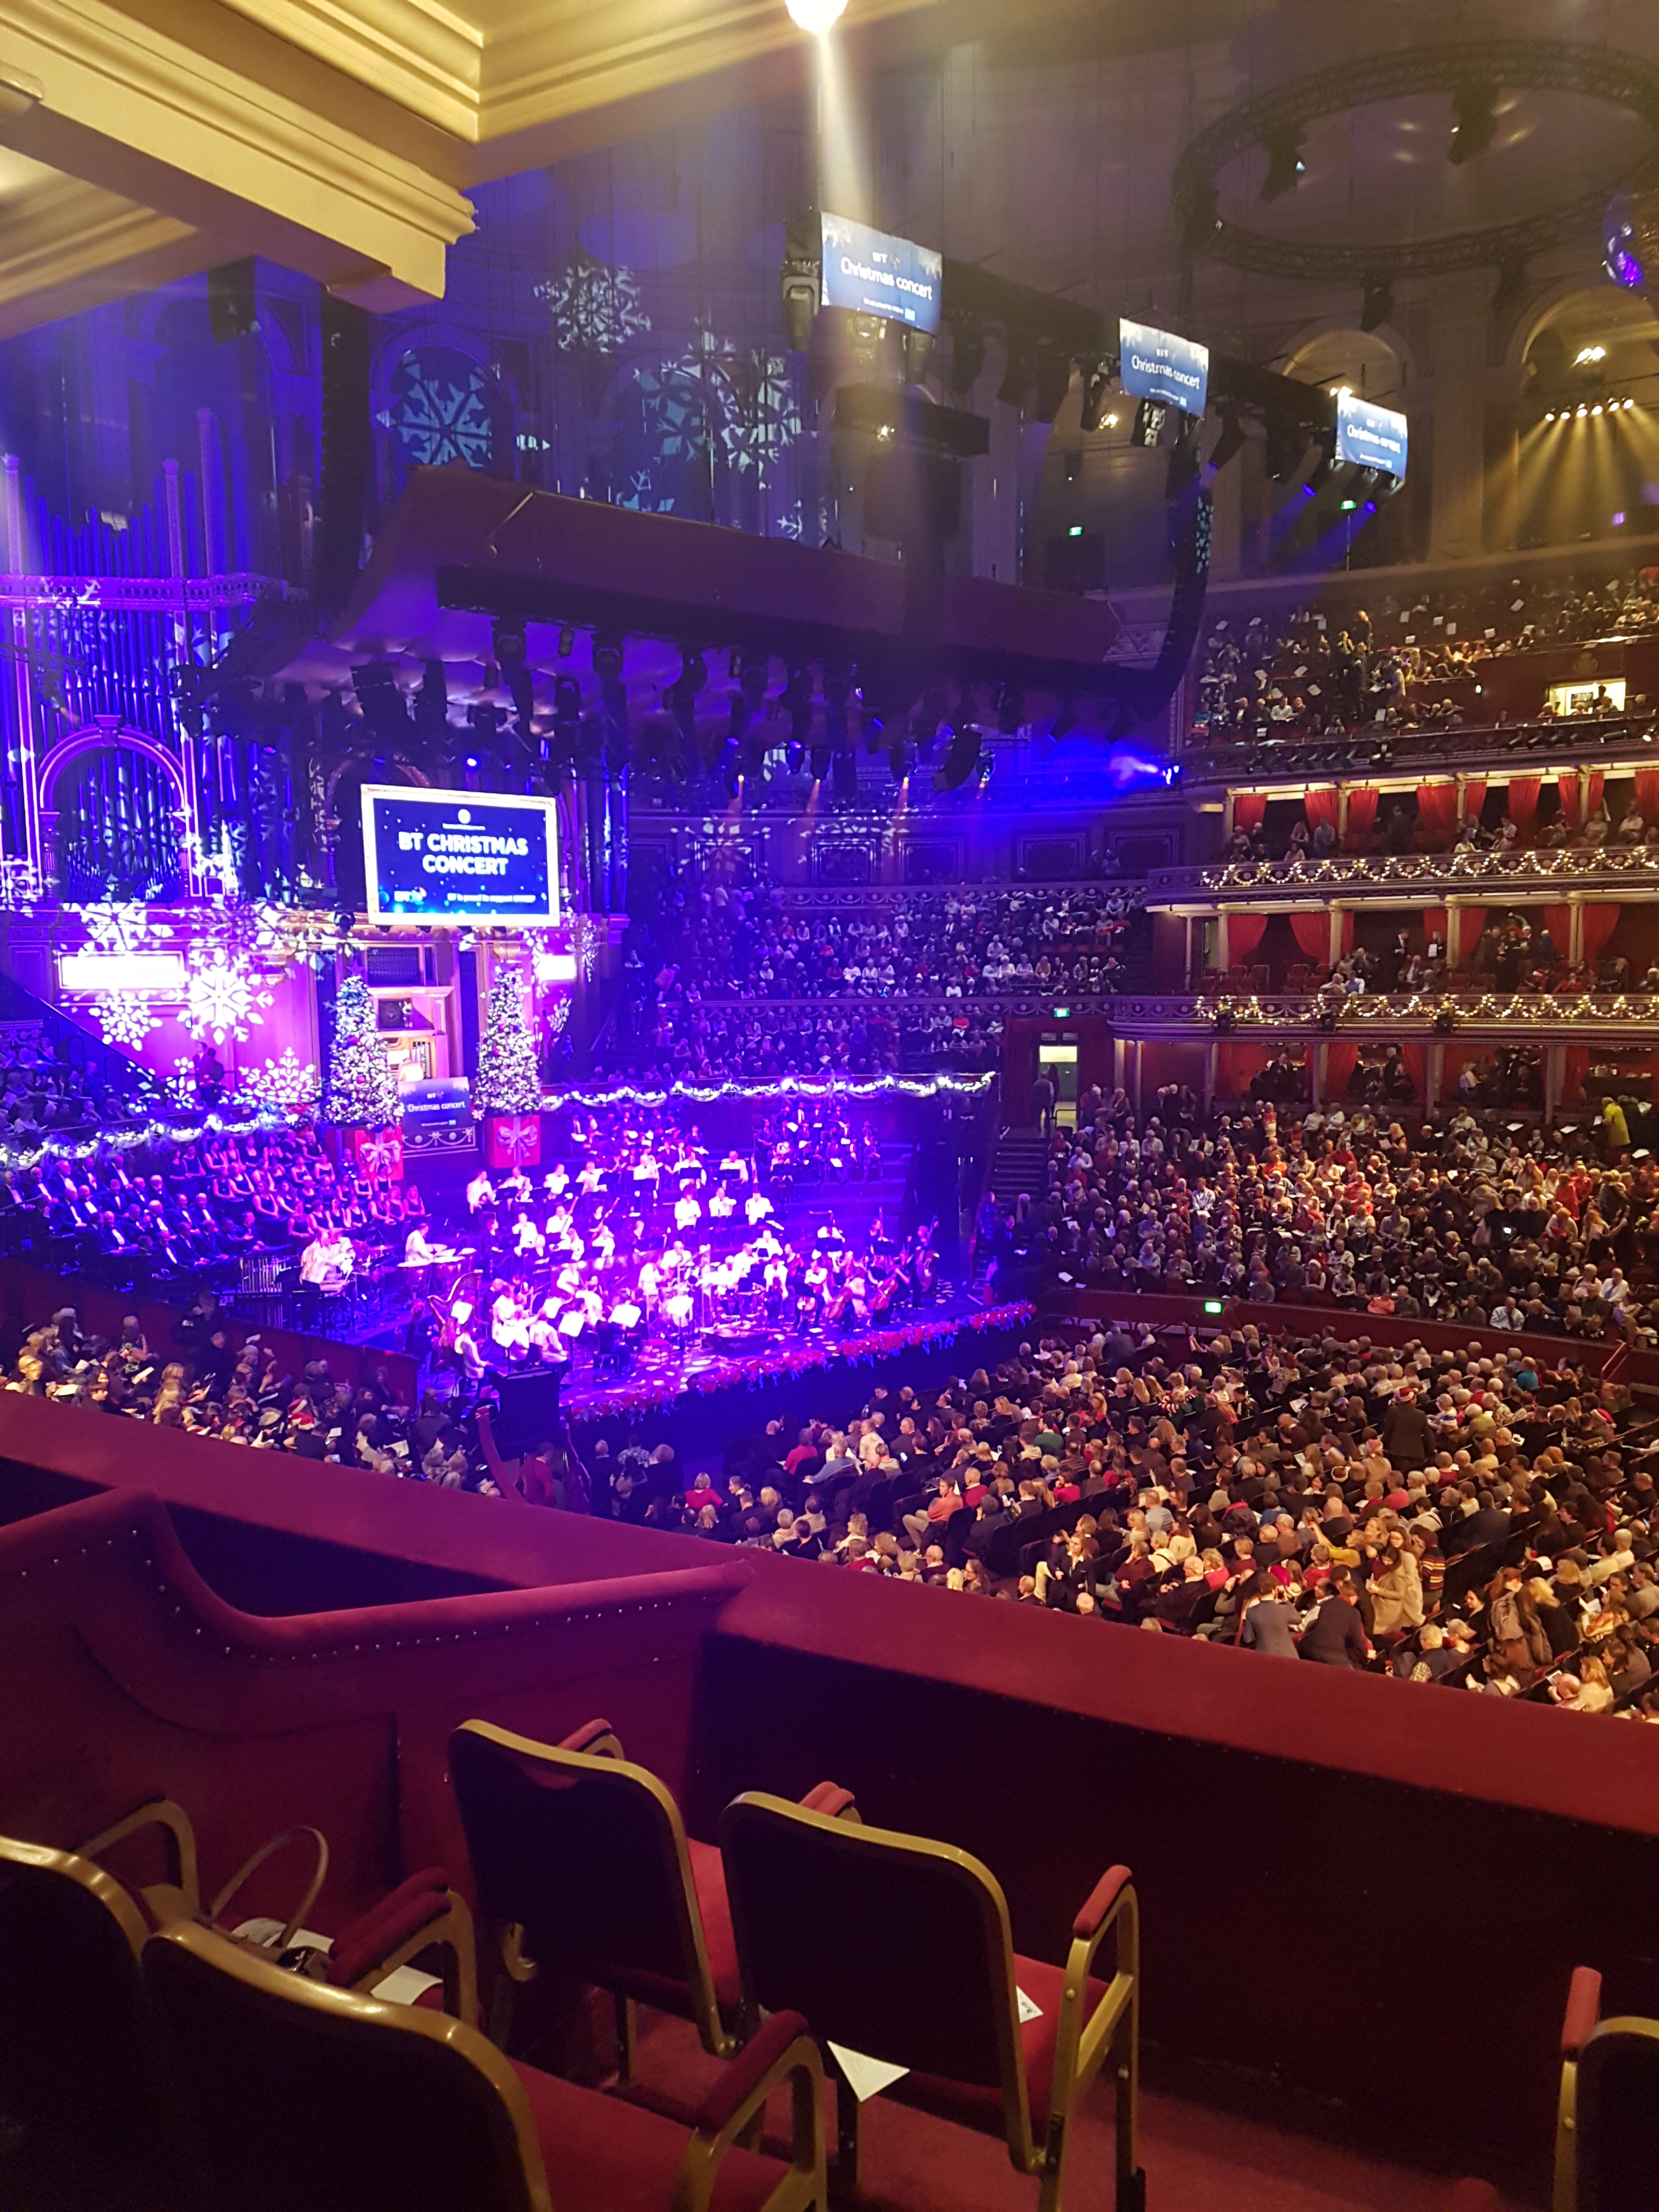 Christmas Concerts Near Me.Bt Christmas Concert At The Royal Albert Hall Escaping